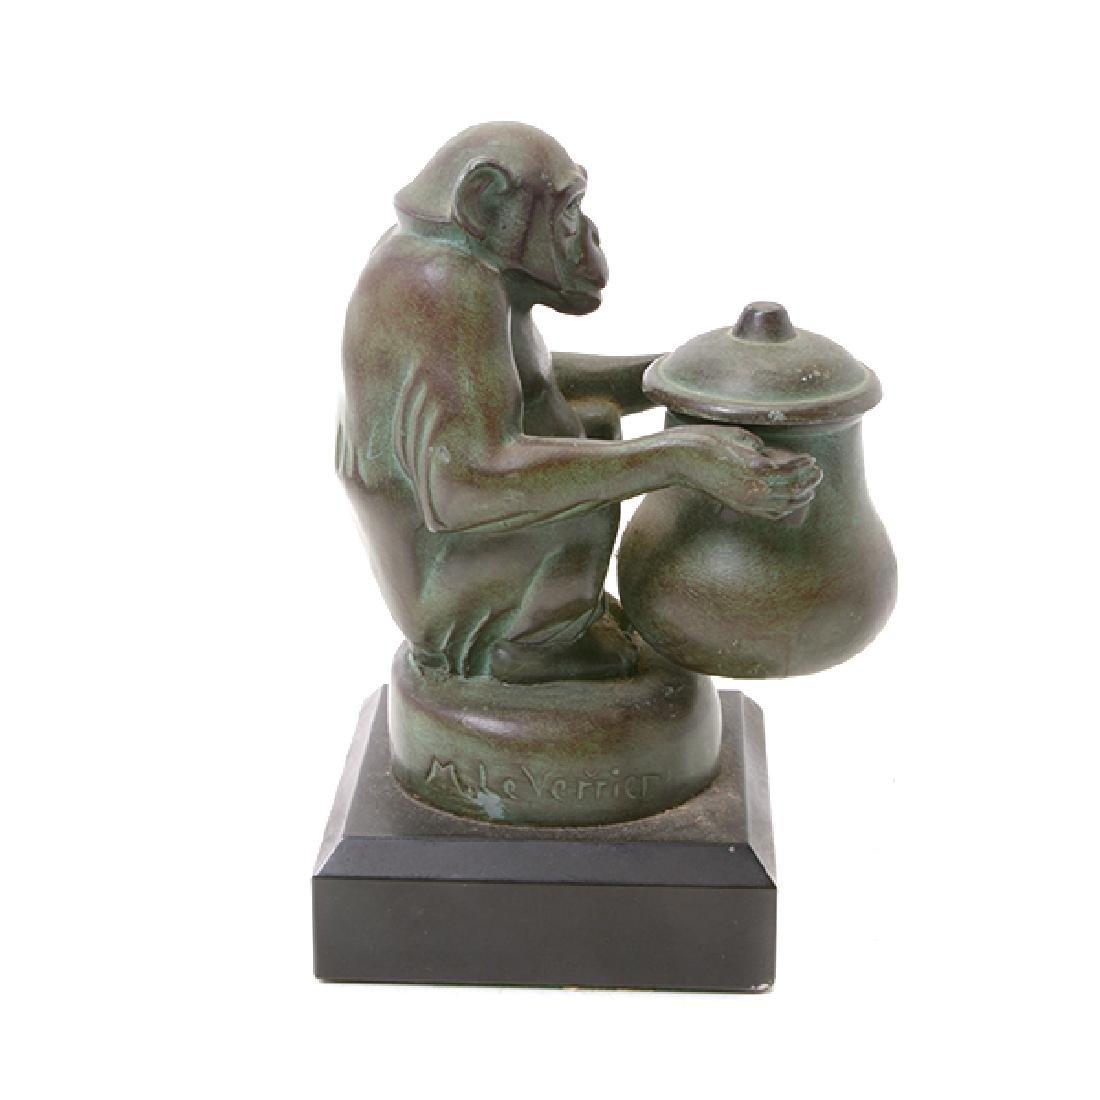 Pair of Bronze Monkey Figures, After M. LeVerrier - 5